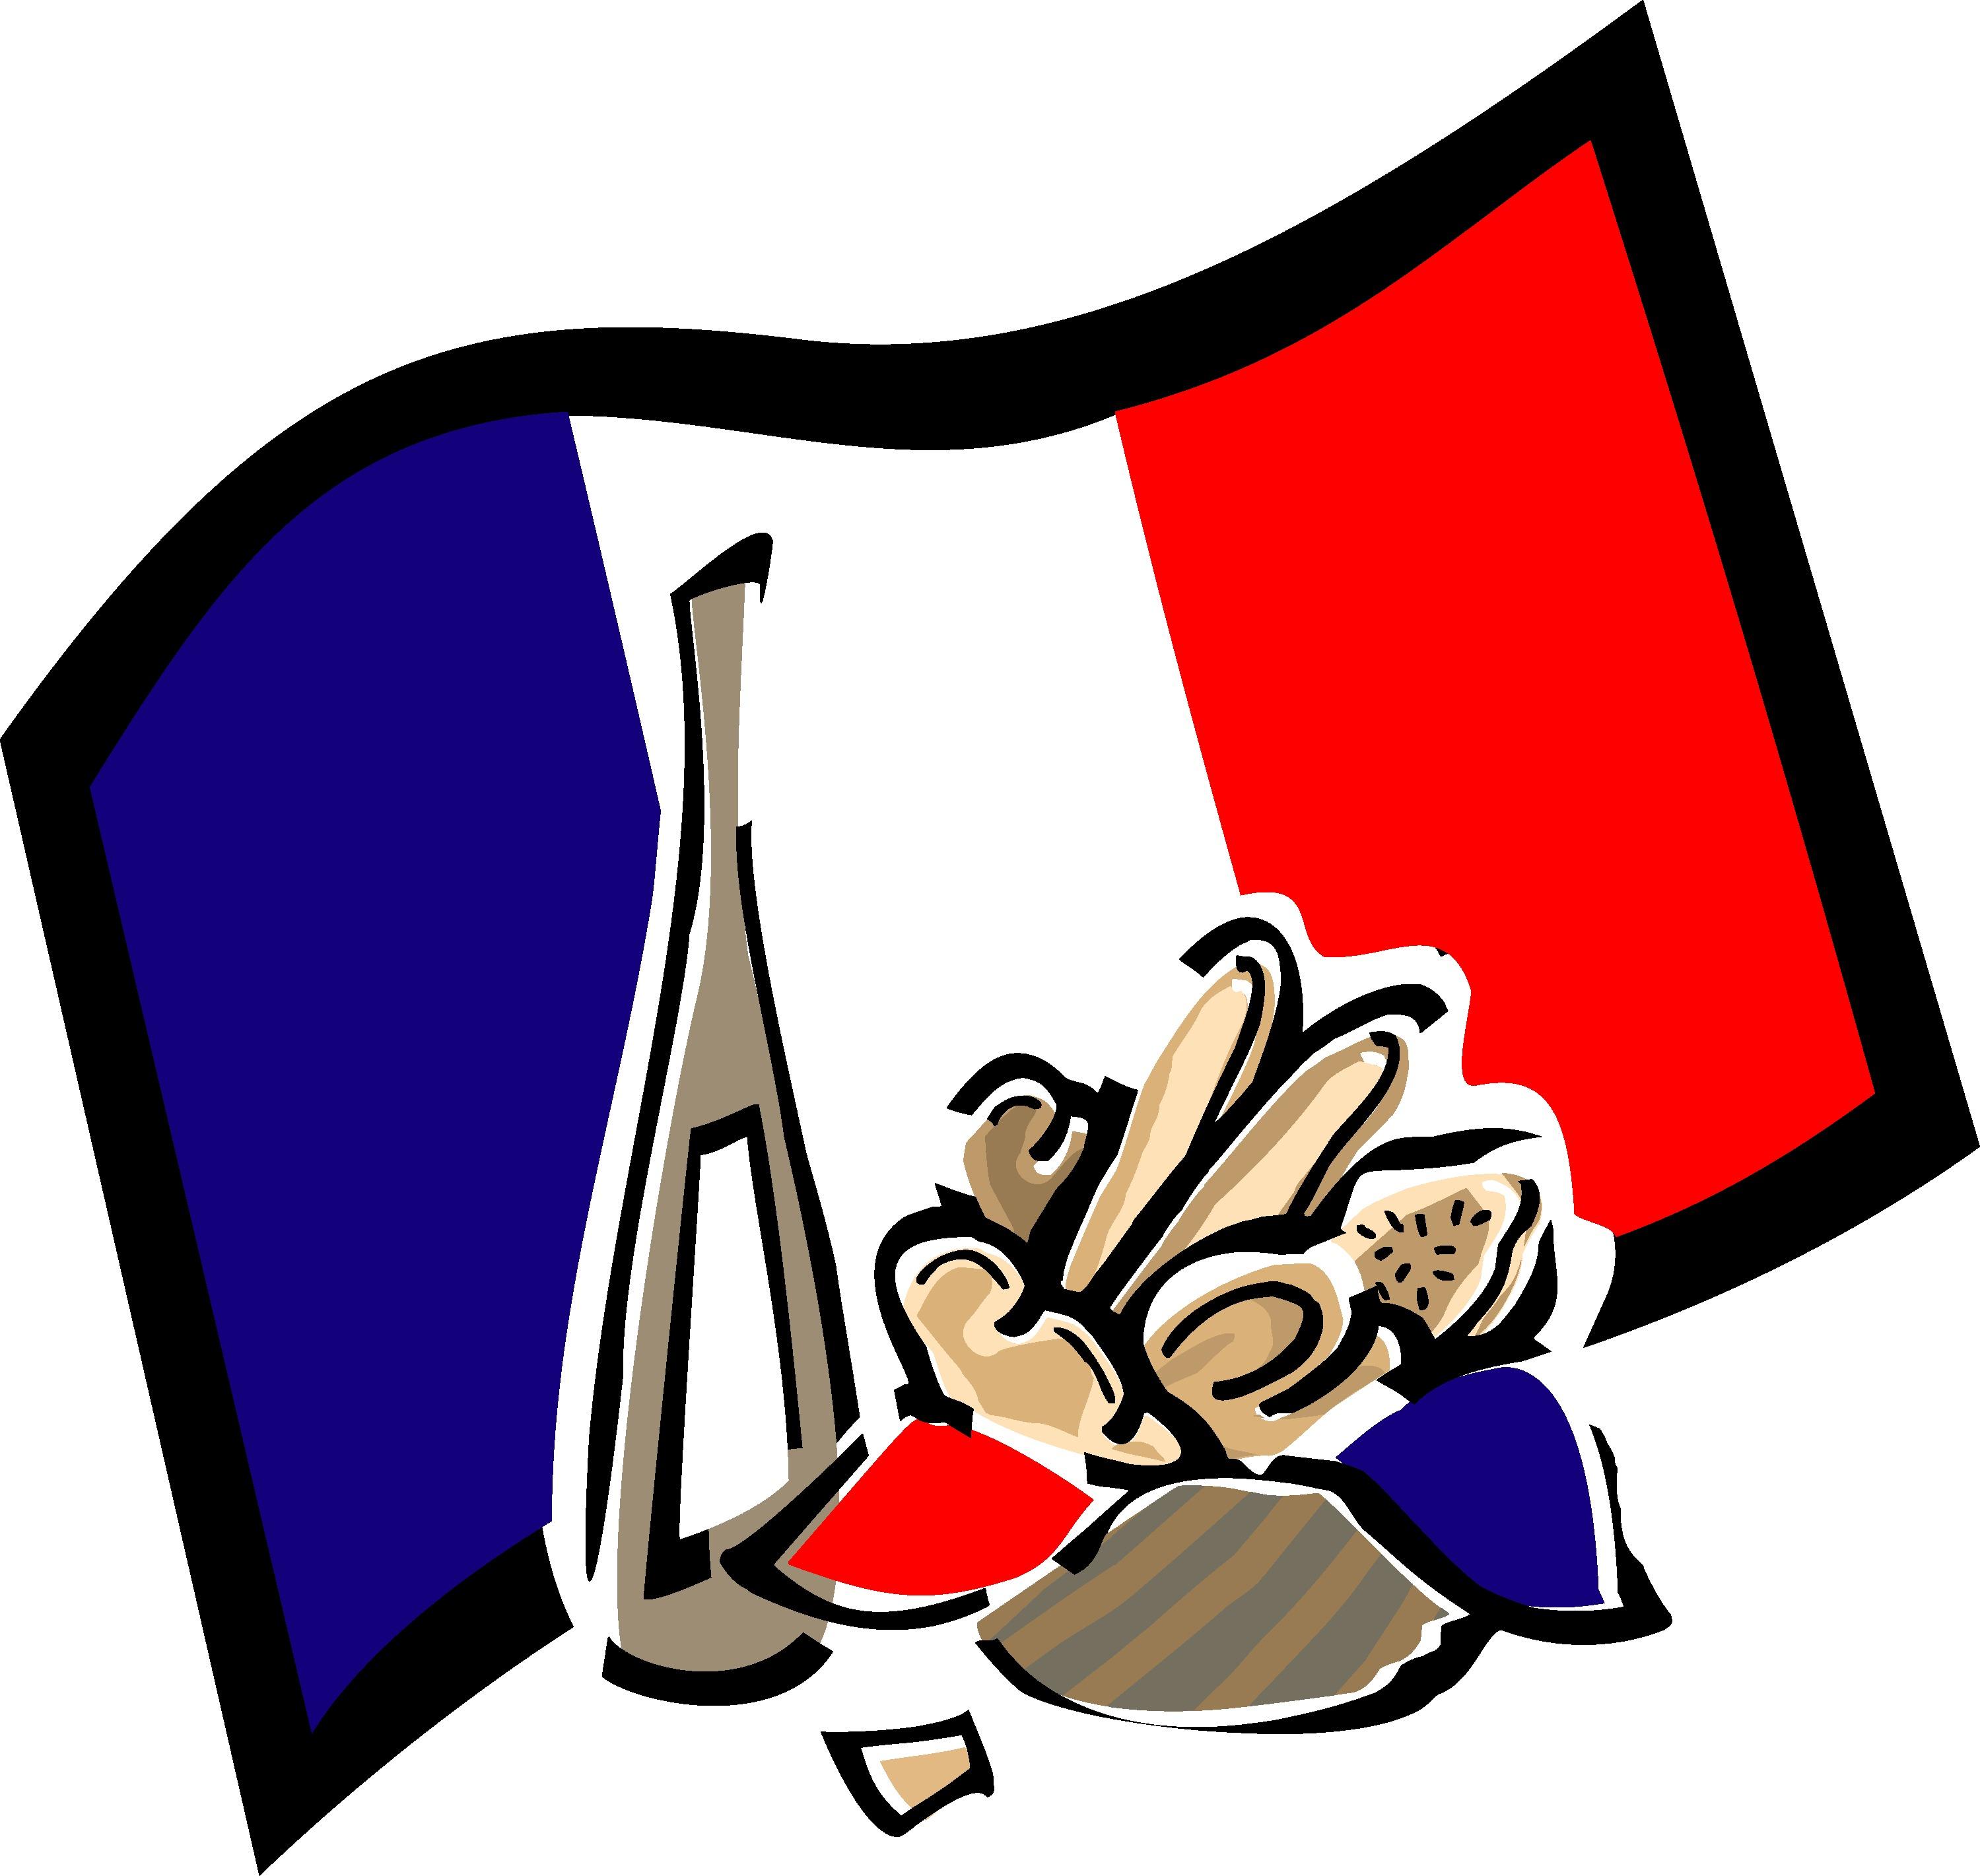 Clip Art French Clipart french flag clip art clipart best tumundografico